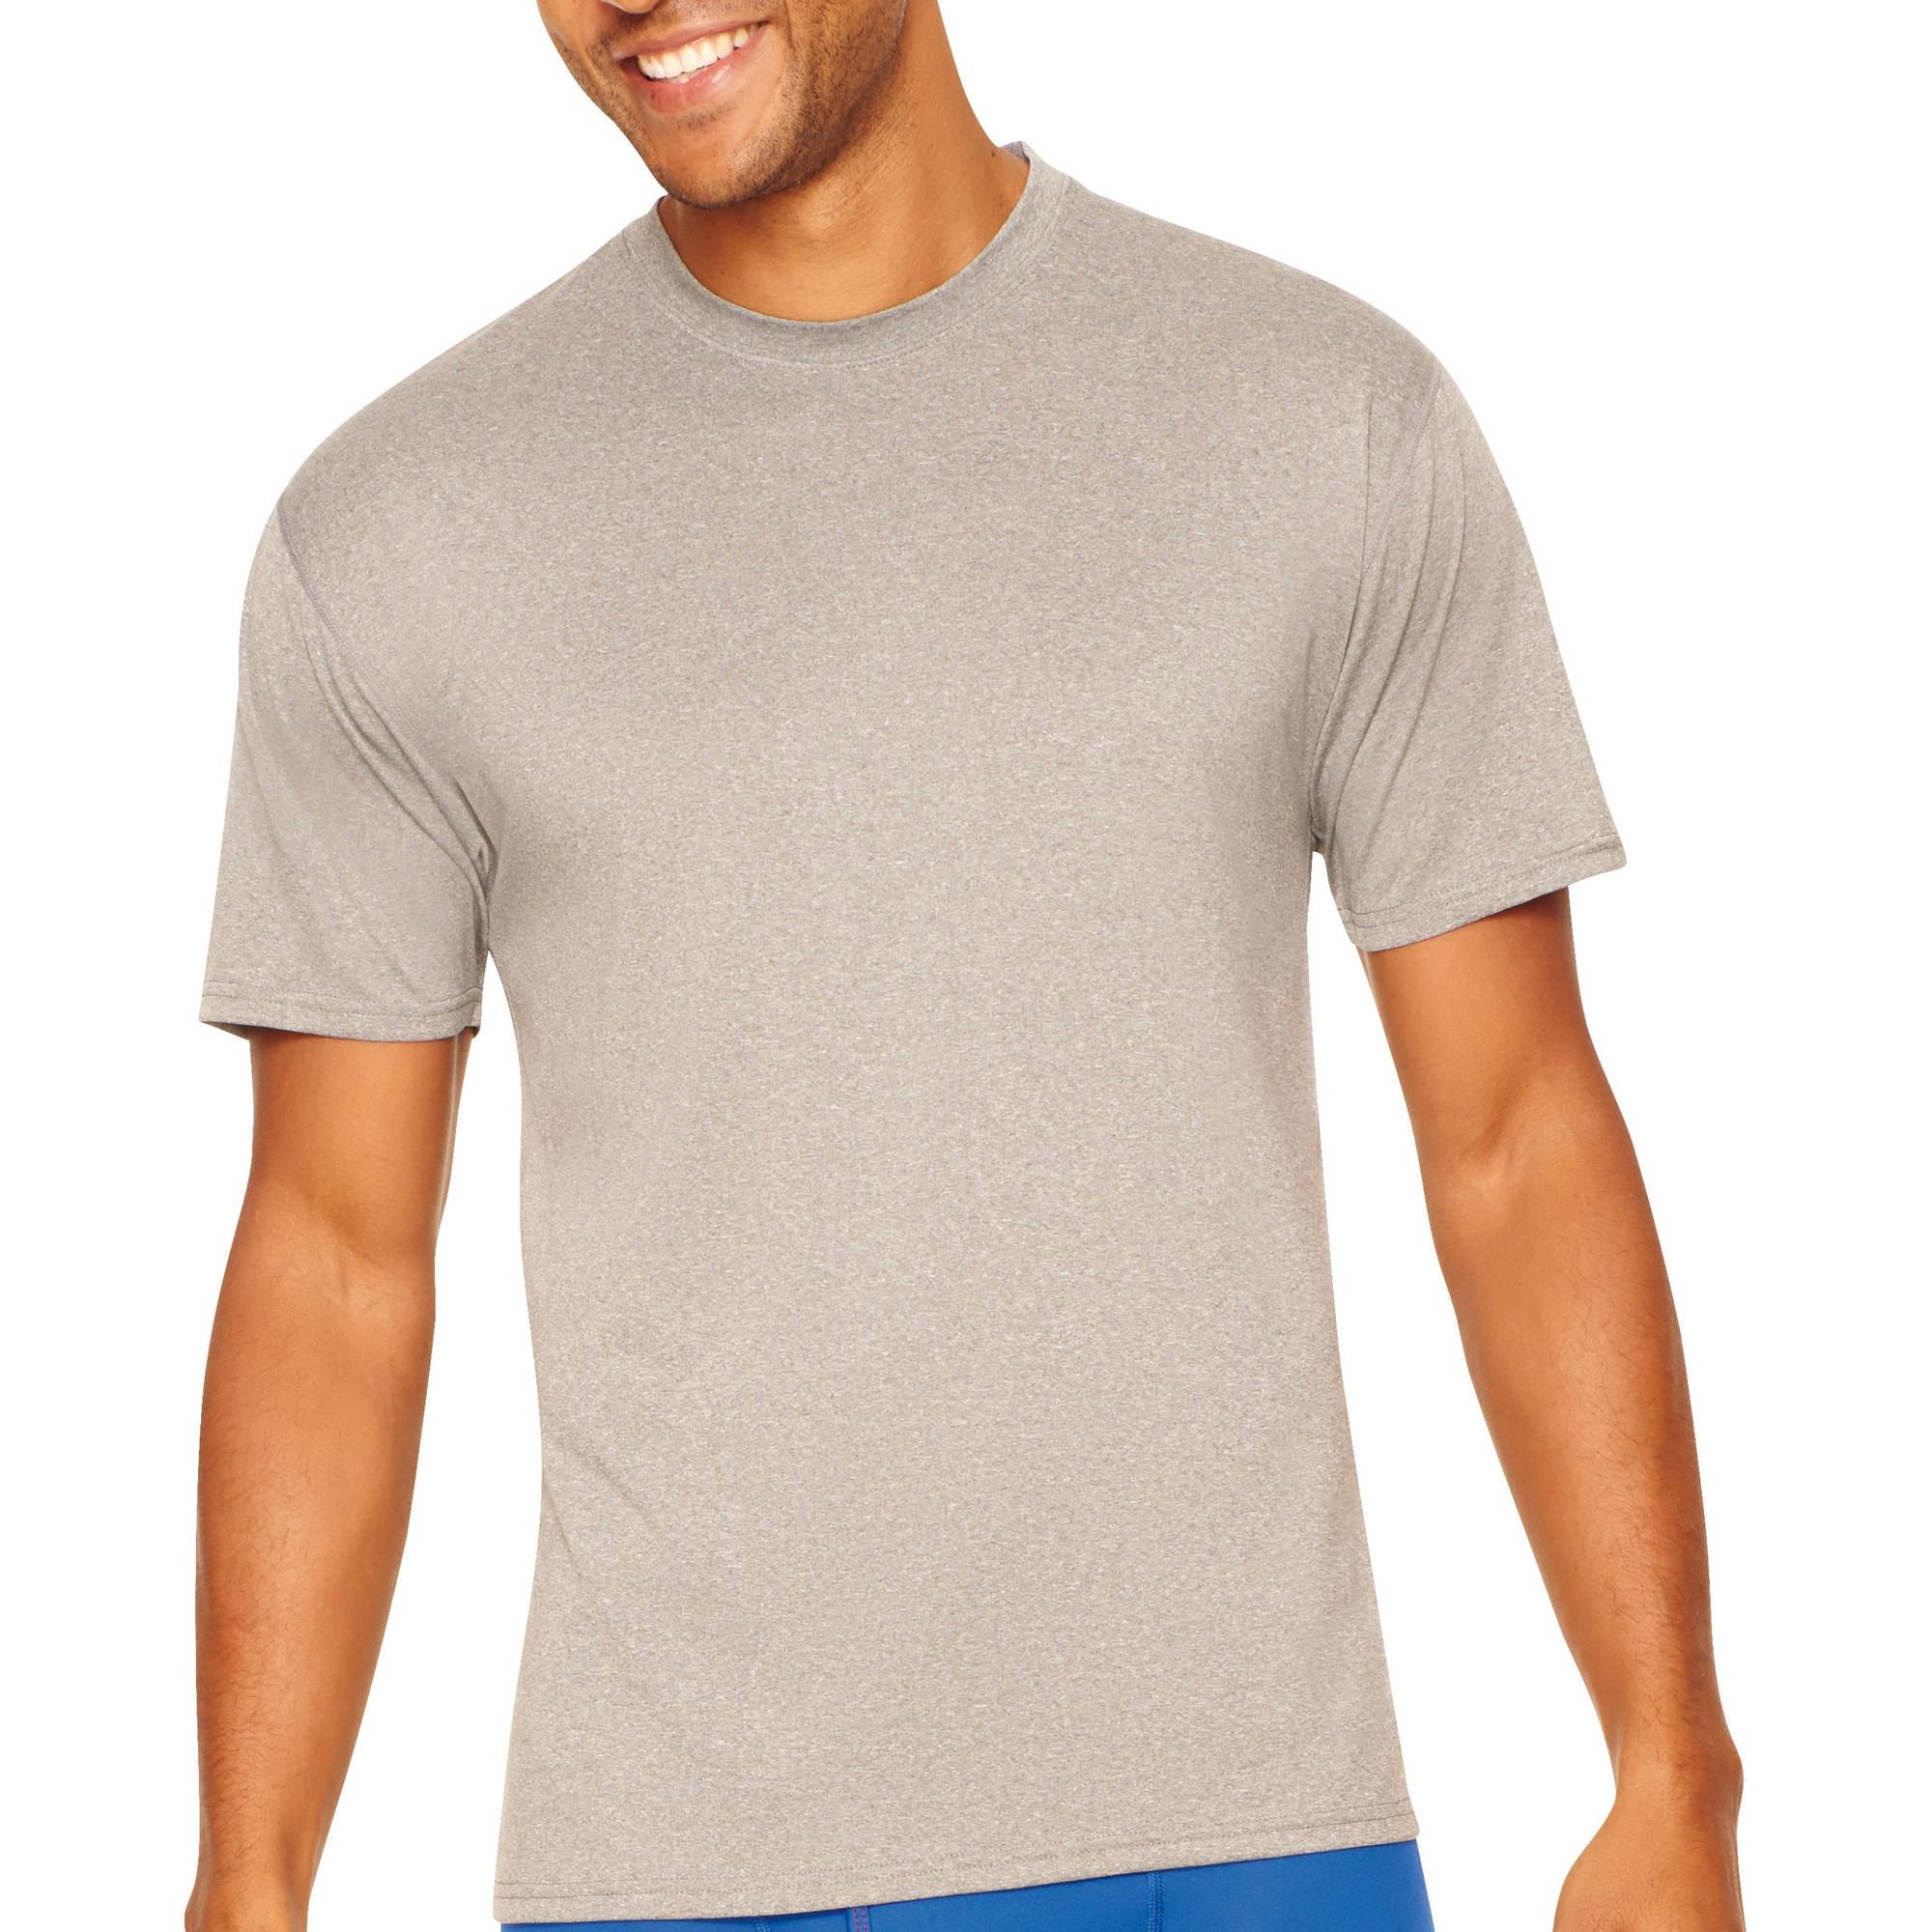 7 Pallets of Hanes Men's 2-Pack X-Temp Performance Cool Crew Neck T-Shirts, 6,124 Packs, Ext. Retail $102,225, Martinsville, VA